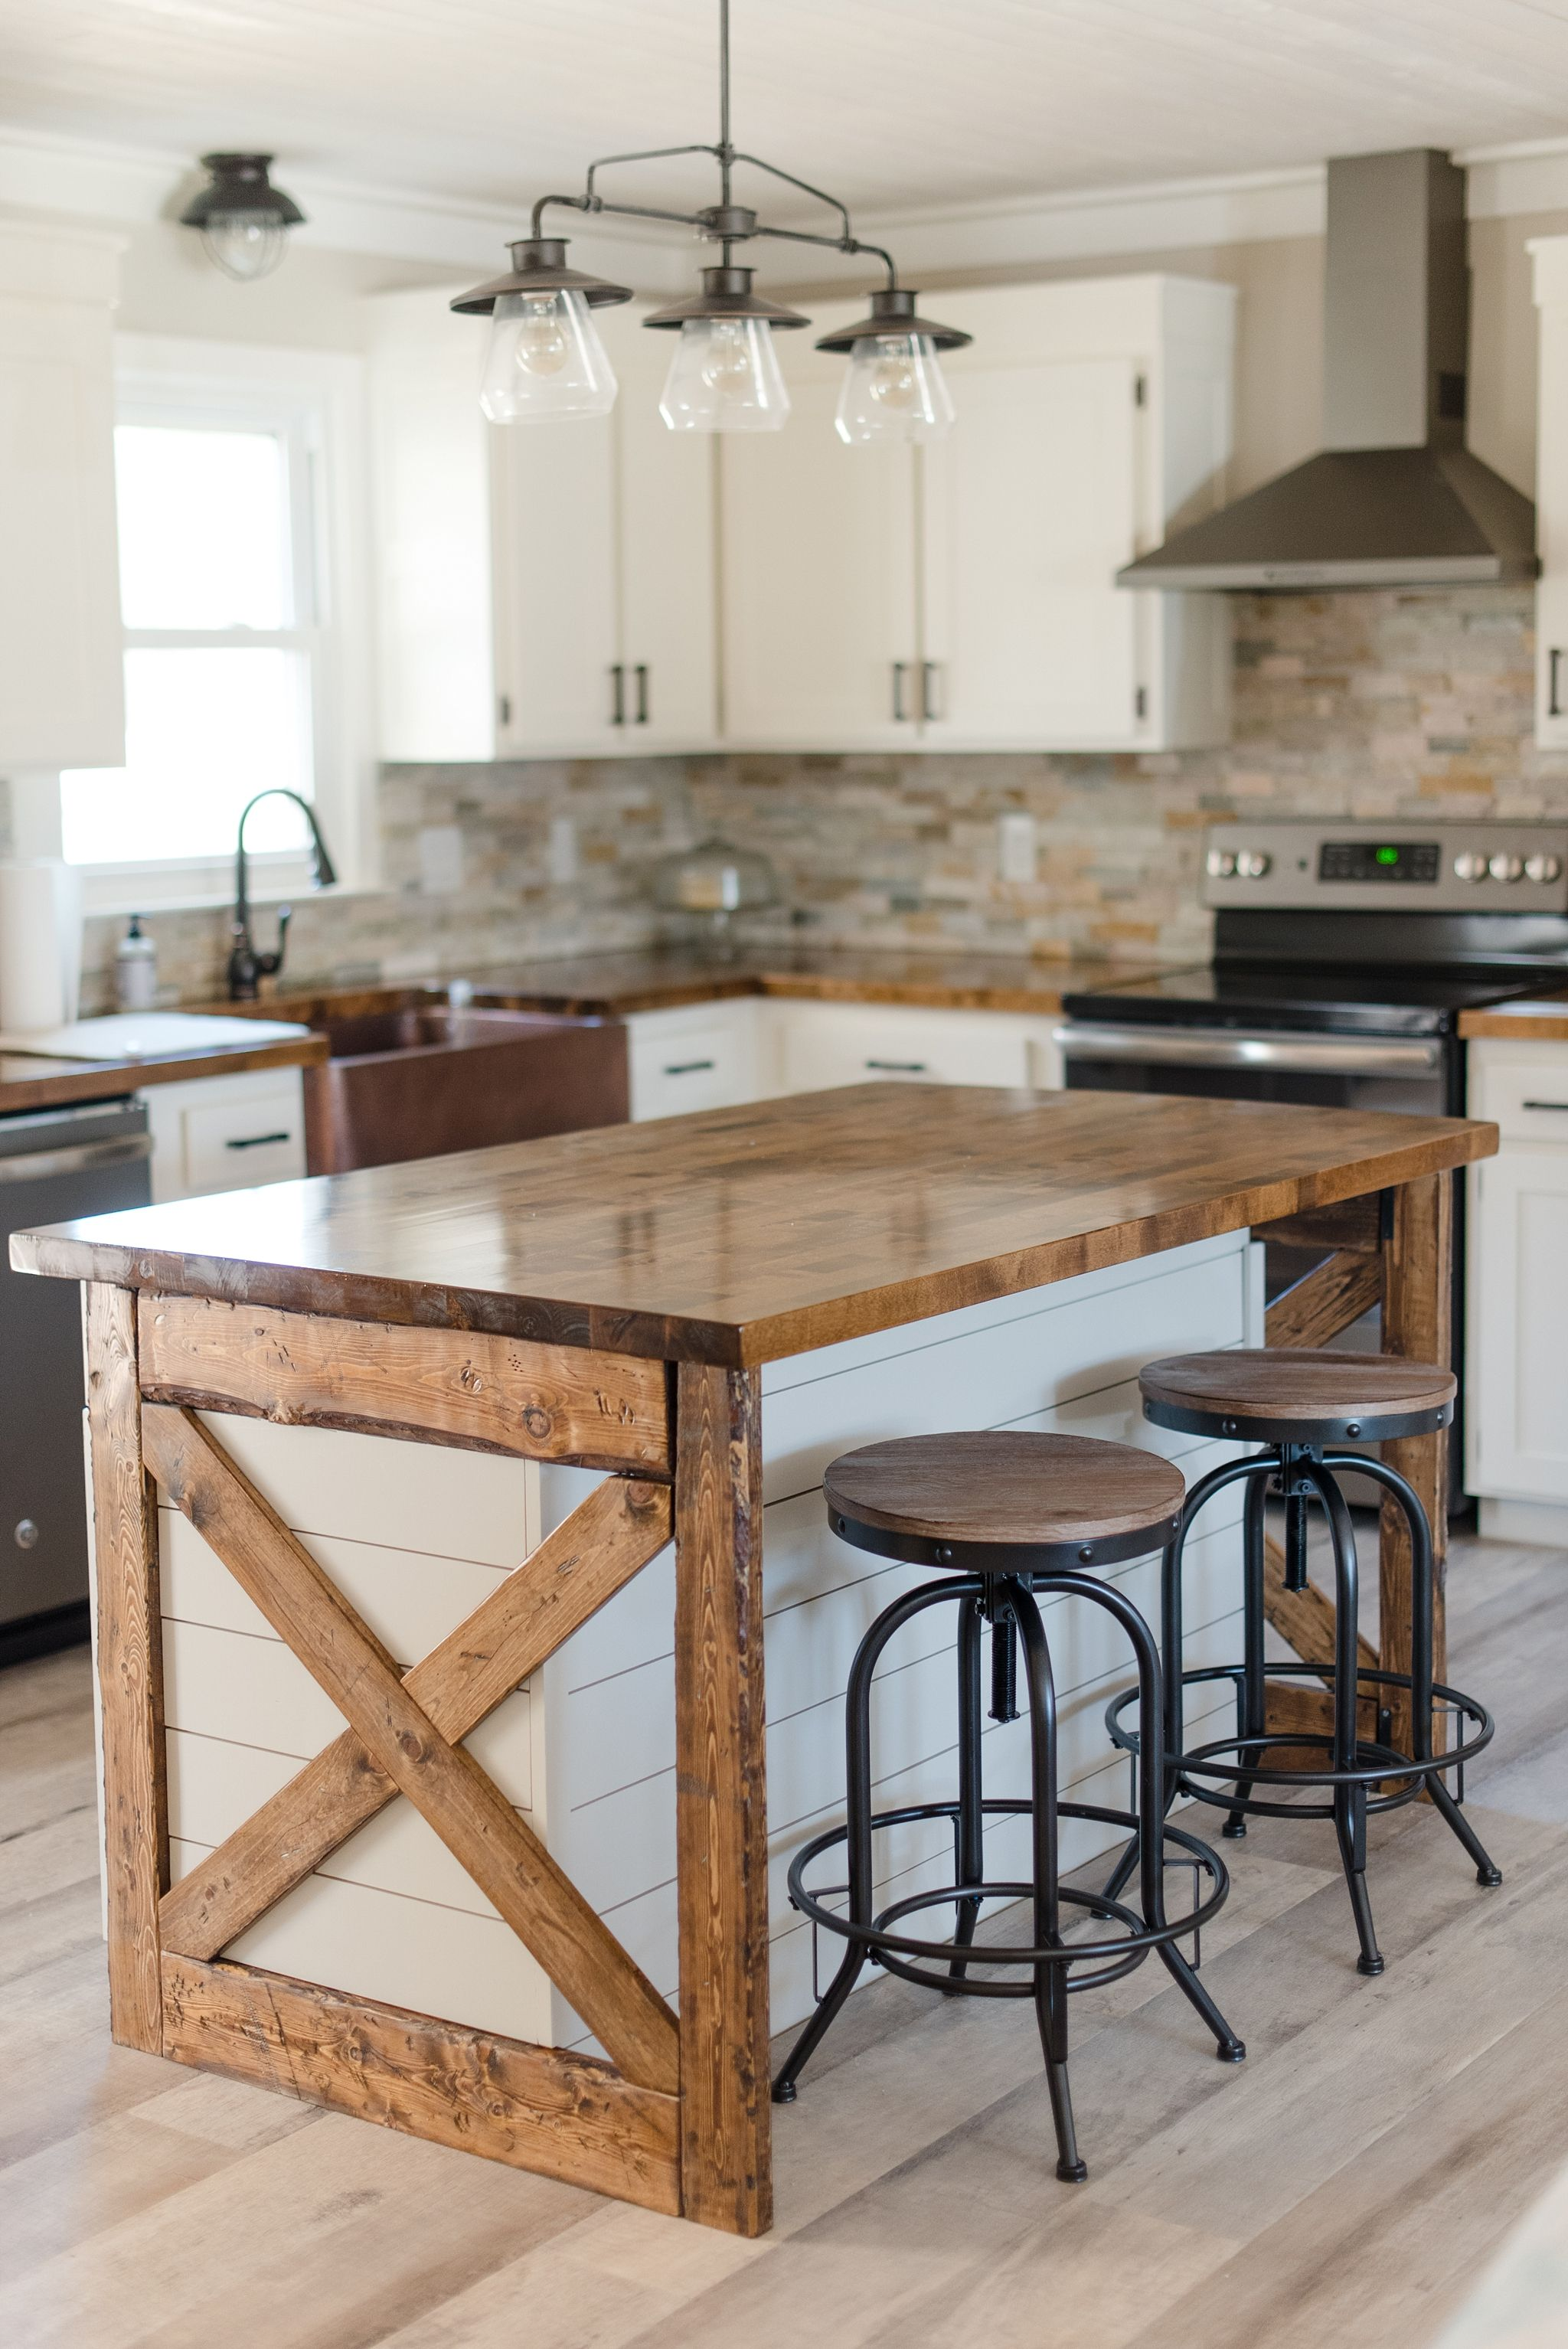 Diy modern farmhouse style kitchen island 2 a